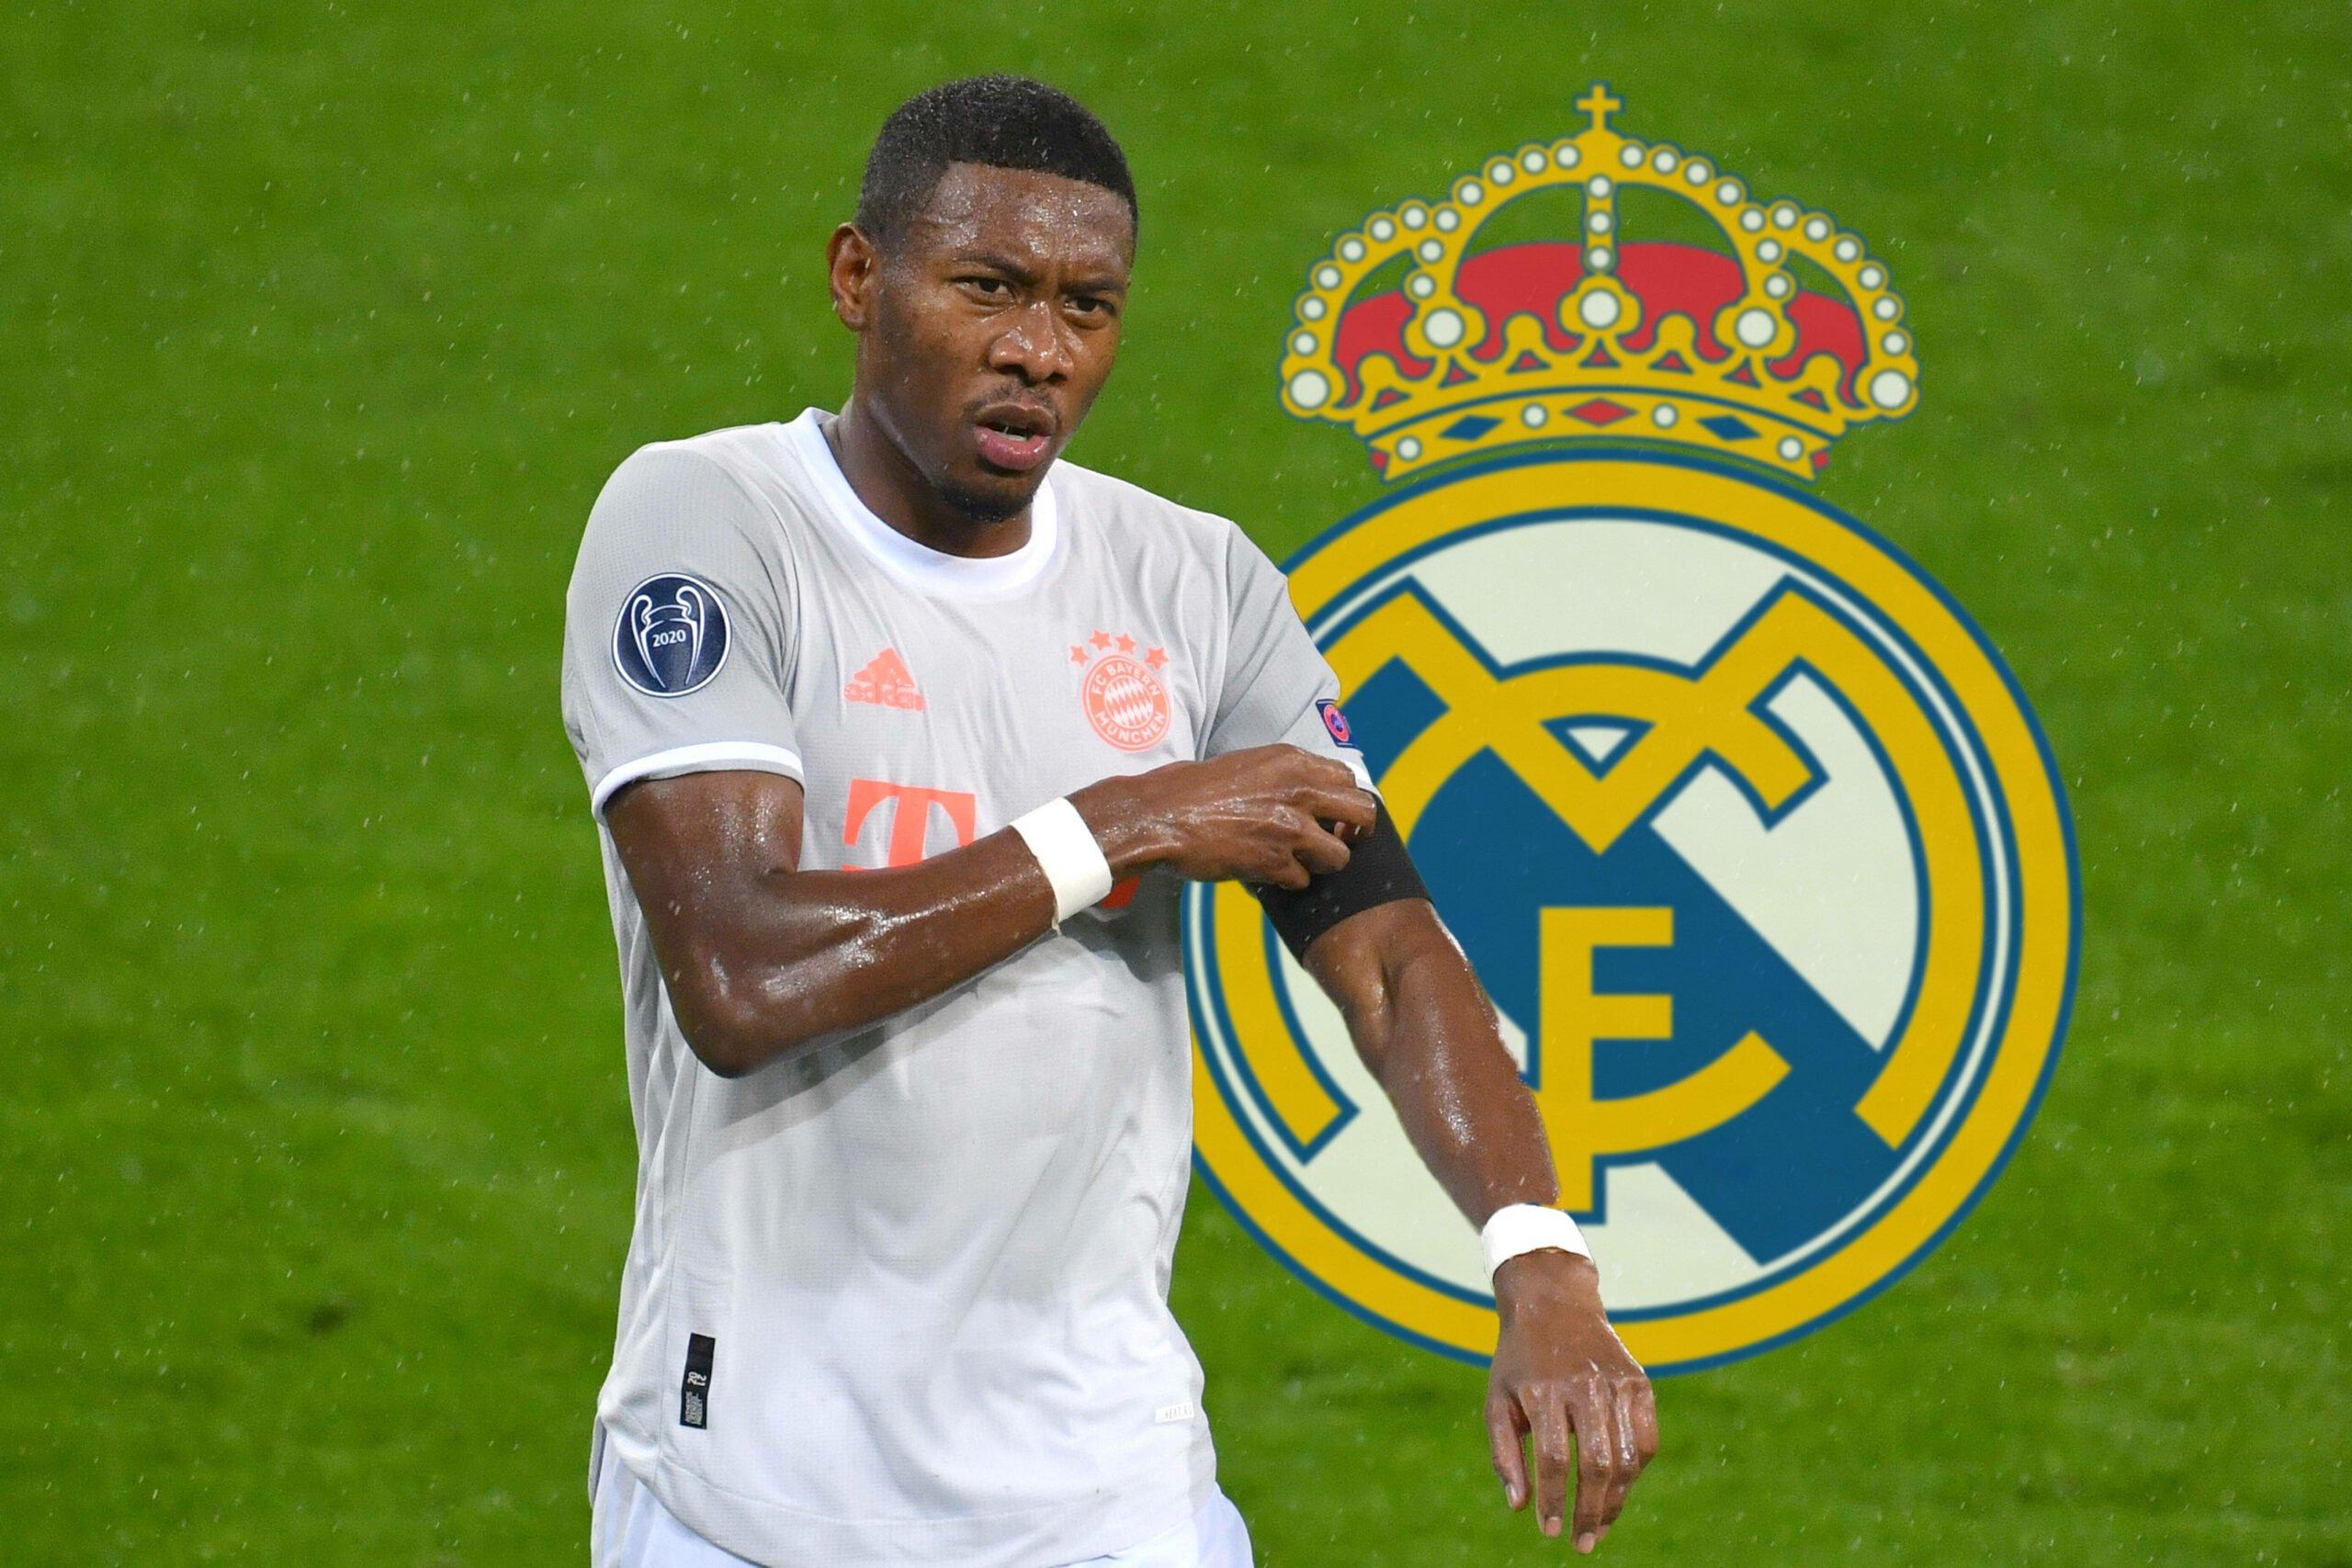 Bericht: Alaba-Wechsel zu Real Madrid droht zu platzen! - Aktuelle FC Bayern News, Transfergerüchte, Hintergrundberichte uvm. - fcbinside.de